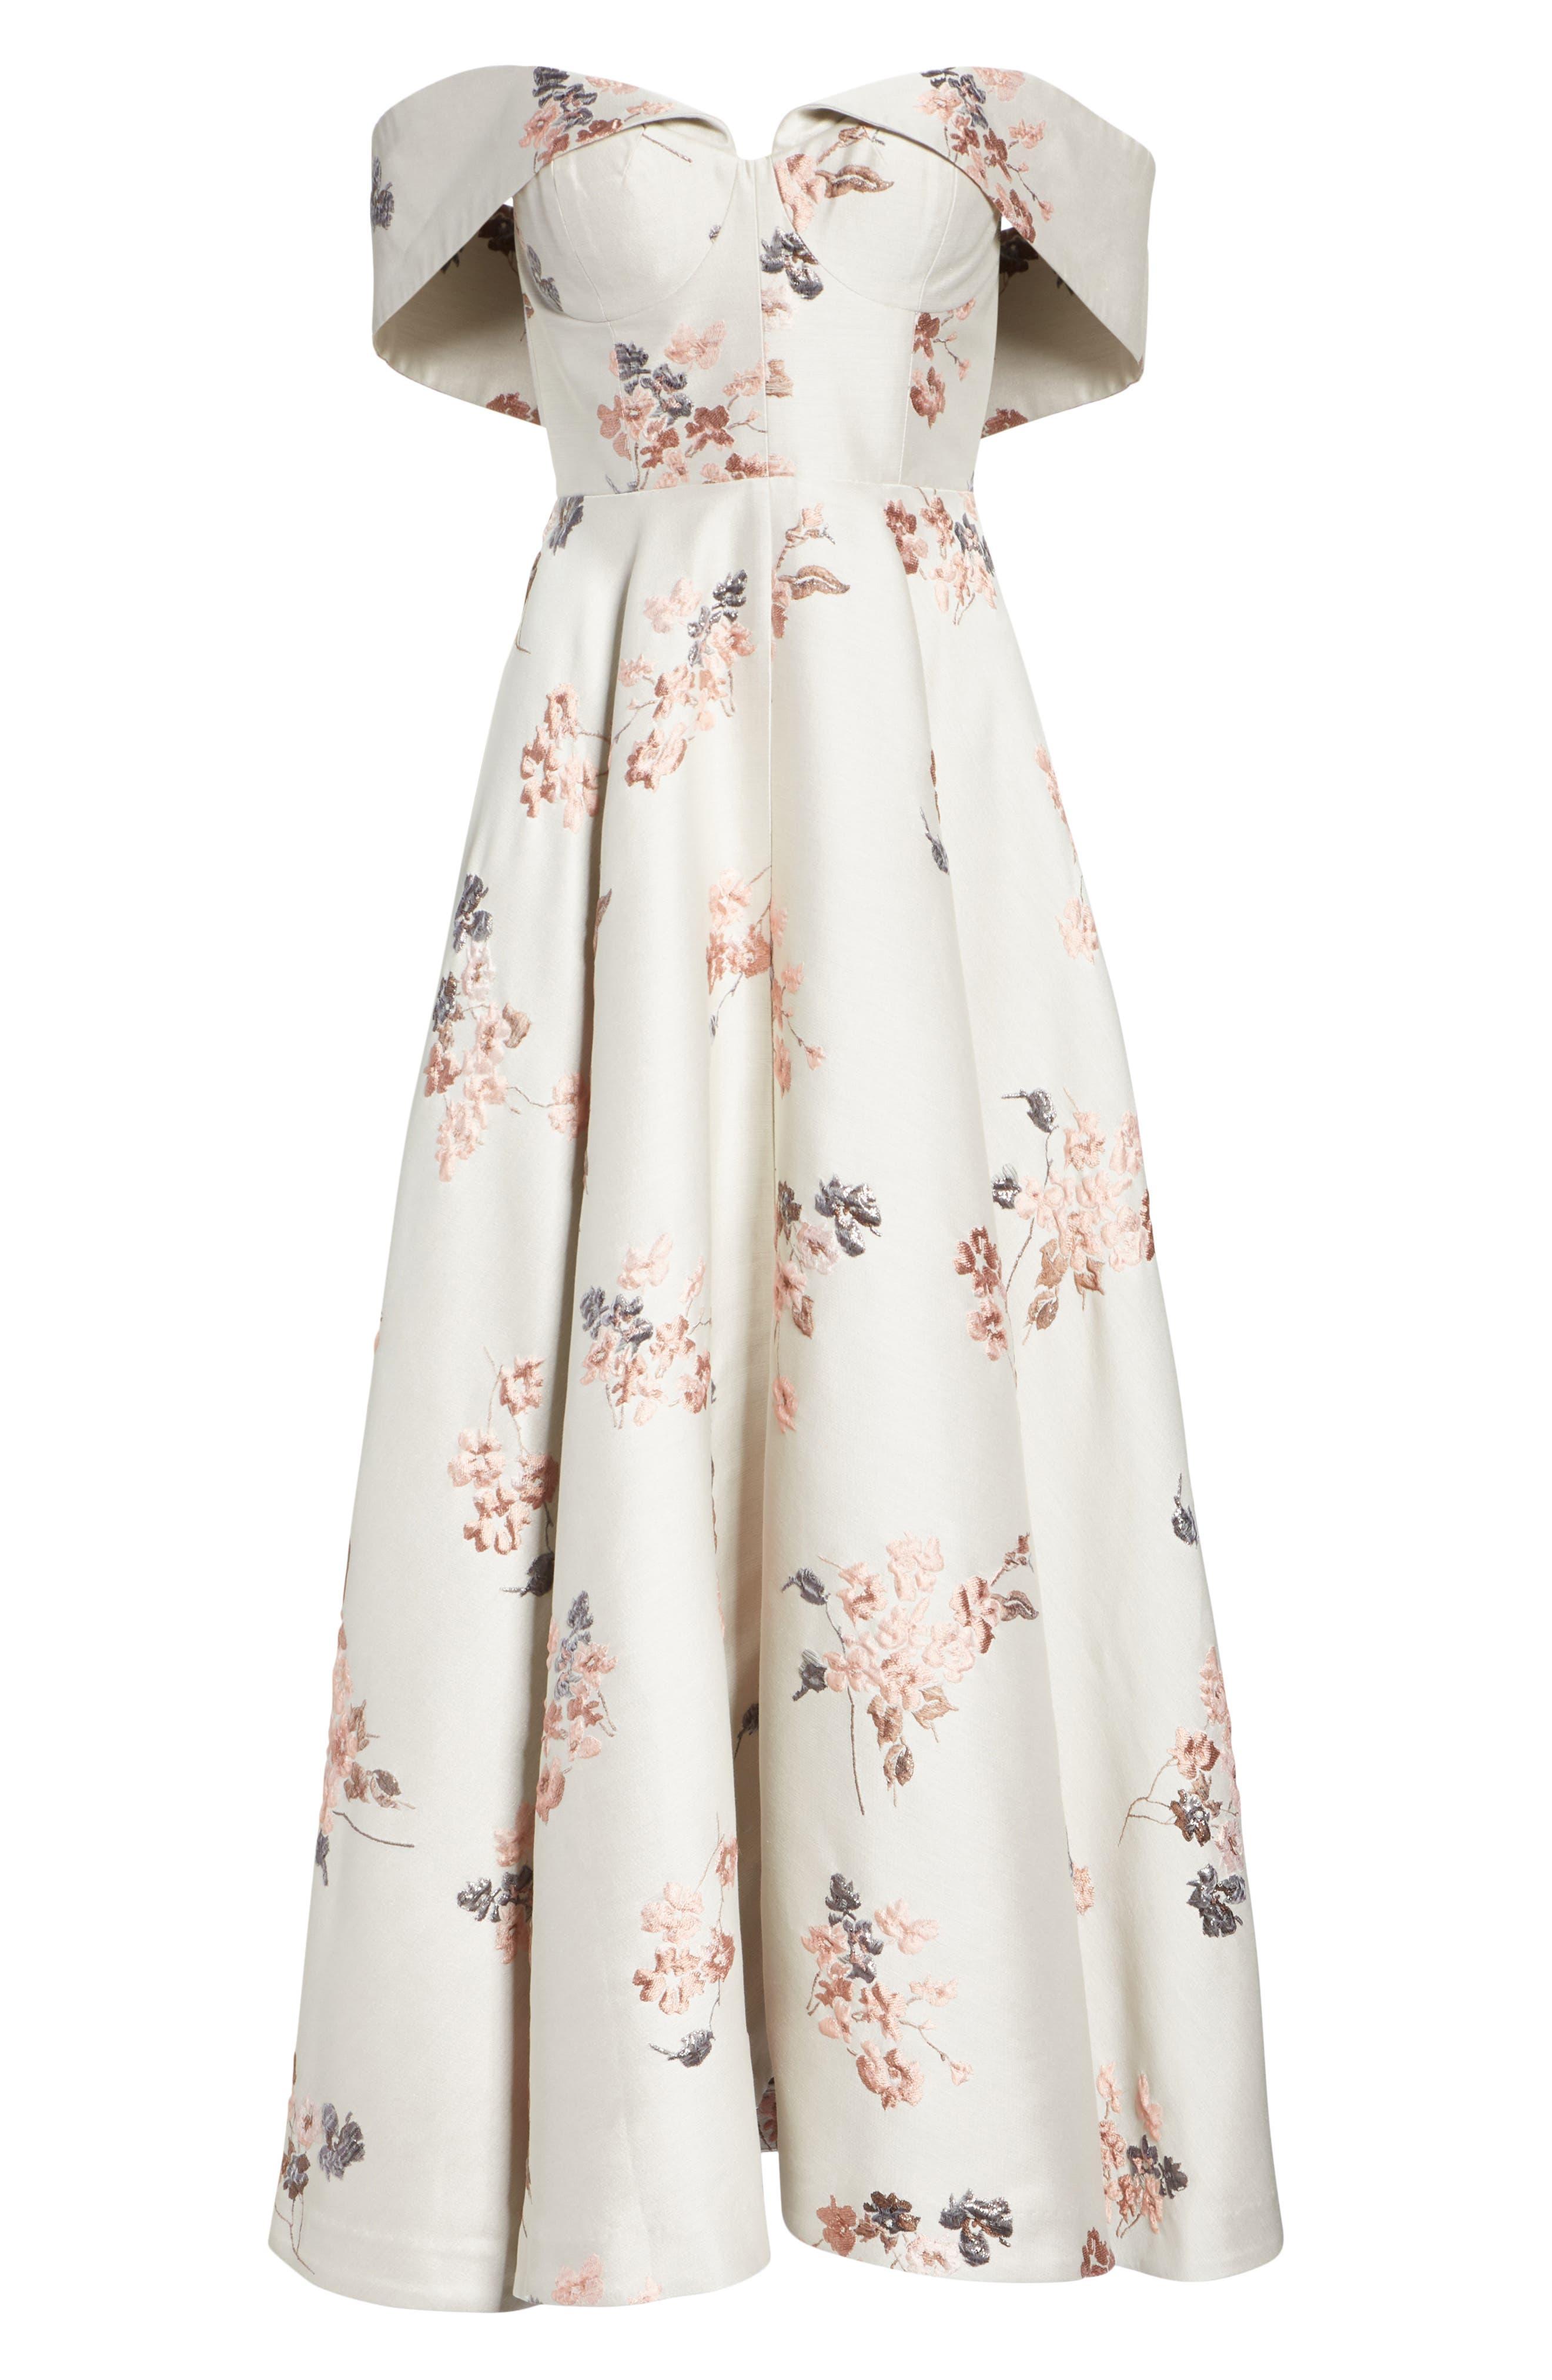 Metallic Floral Jacquard Off the Shoulder Dress,                             Alternate thumbnail 7, color,                             275